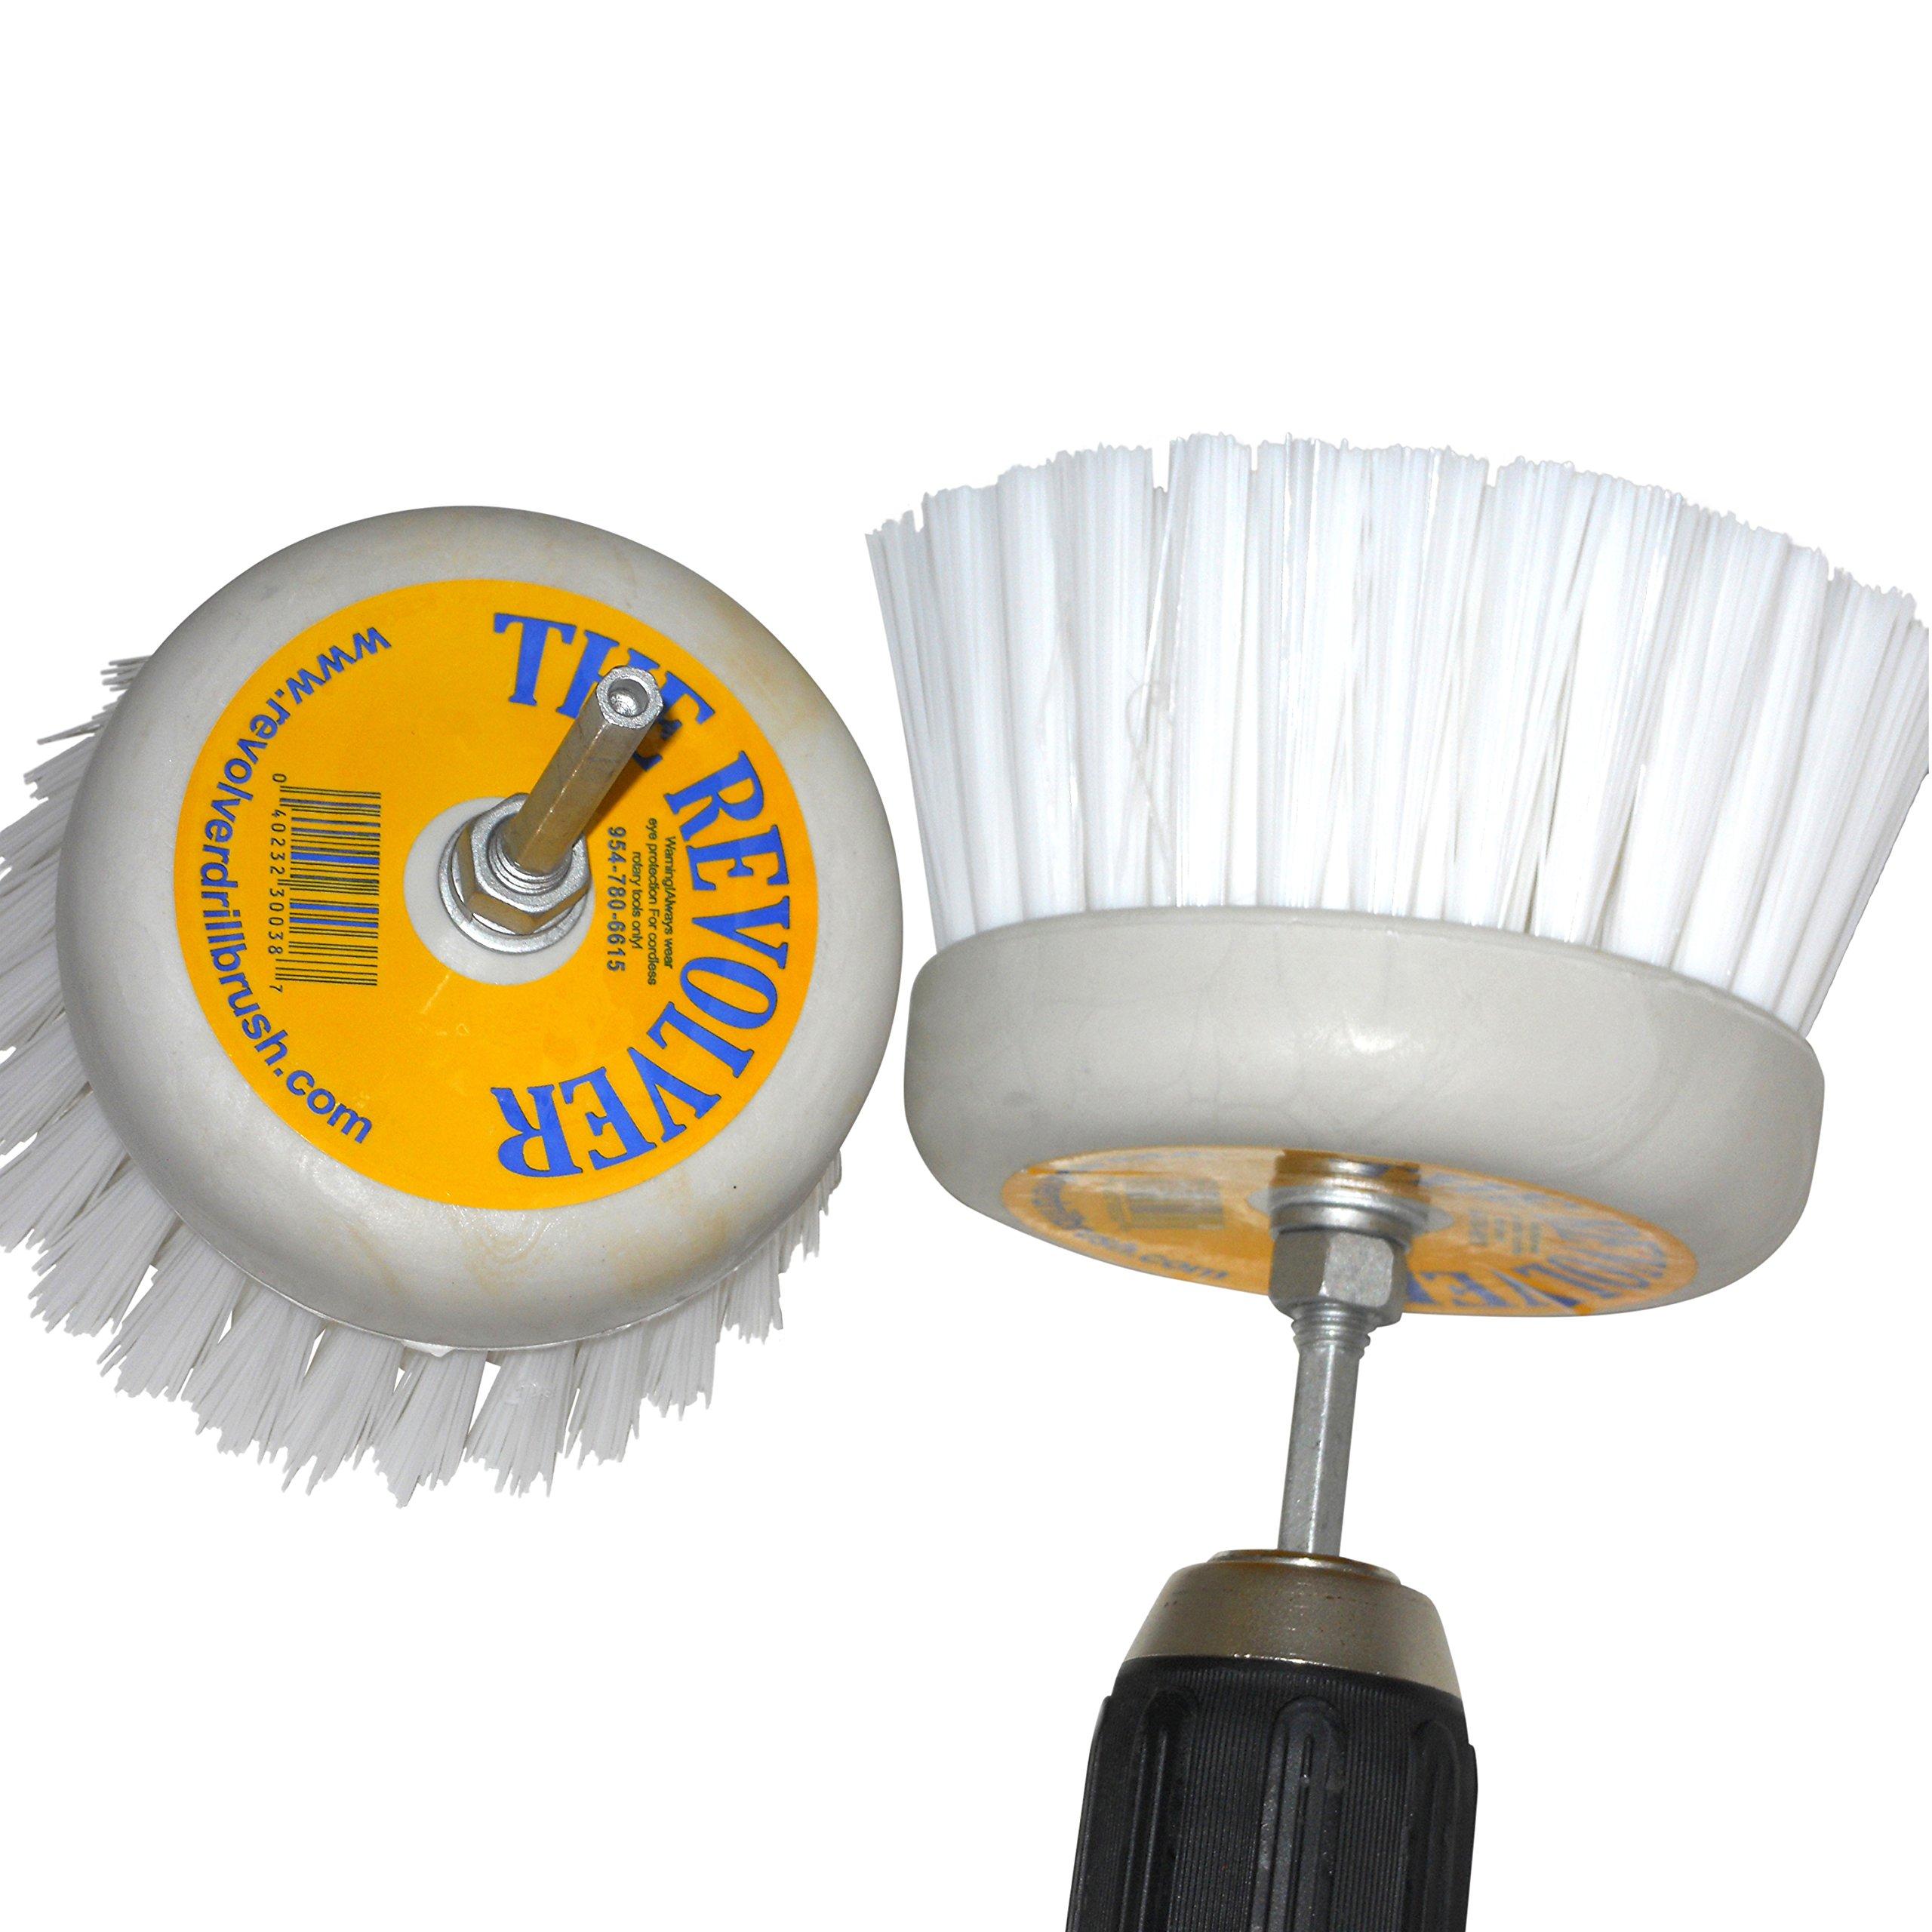 Revolver Drill Brush - Power Scrubbing Drill Attachment - Multi-Purpose Cleaning Tool (2 Pack)